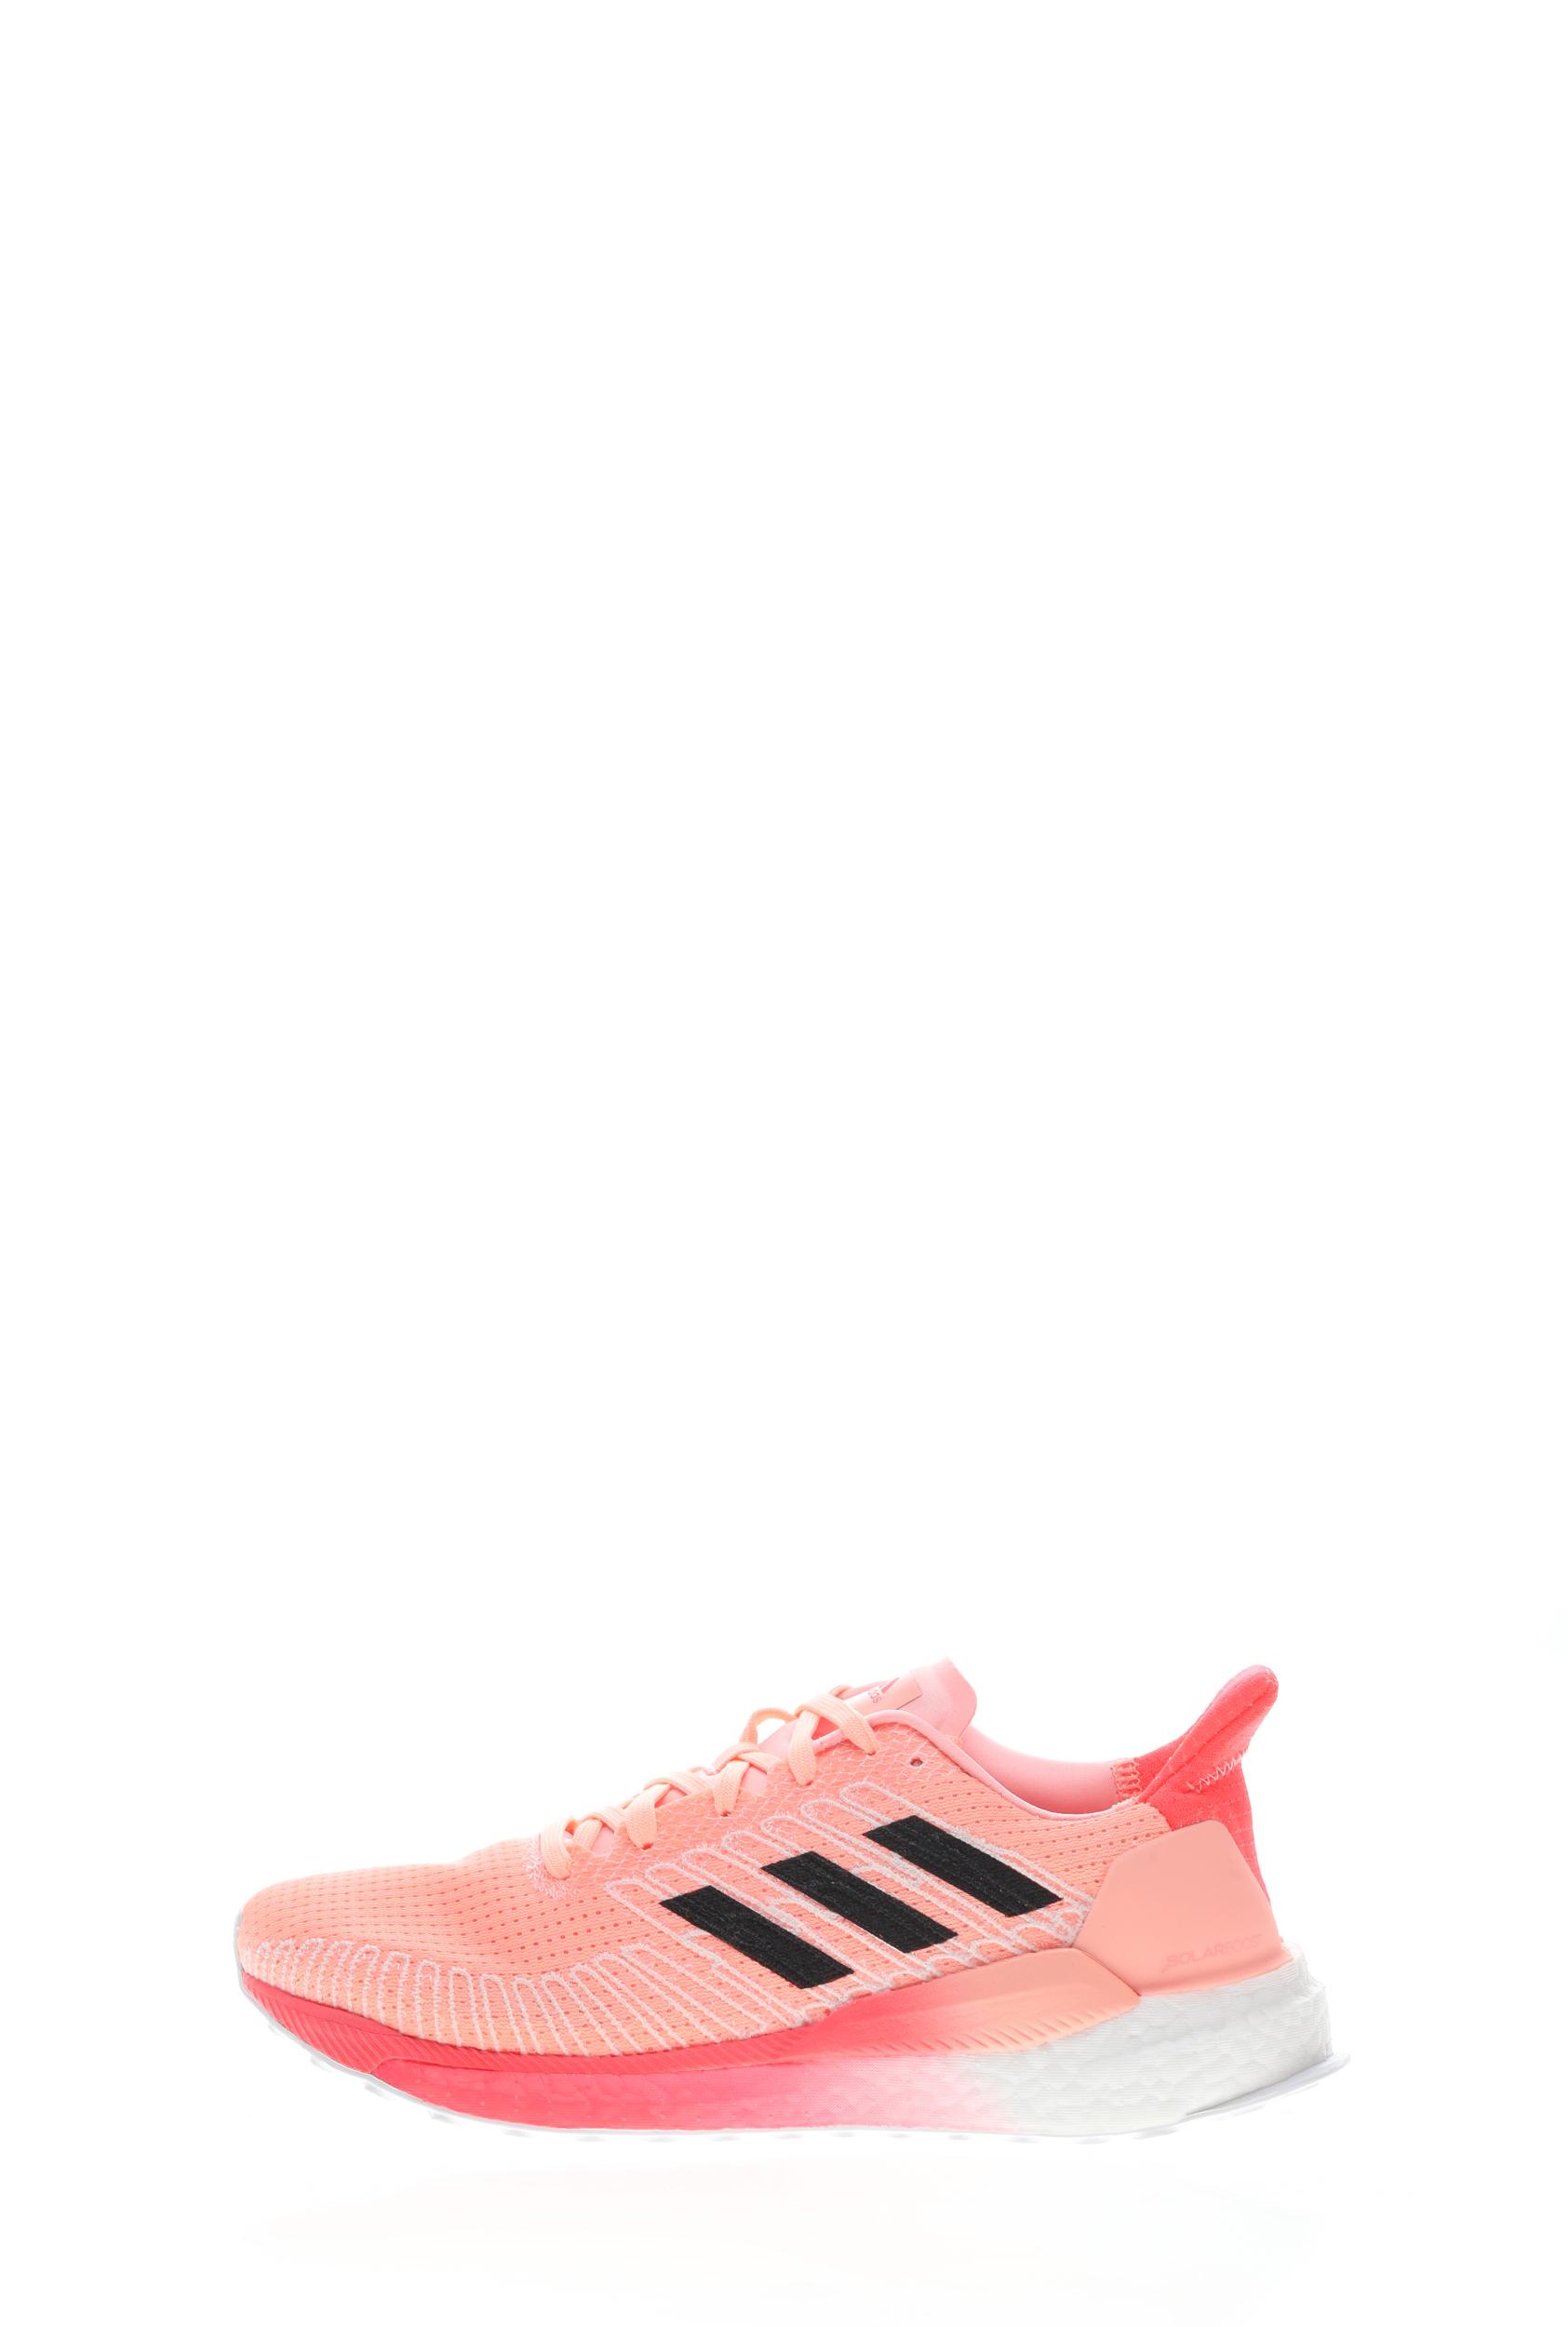 adidas Performance – Γυναικεία παπούτσια running adidas Performance SOLAR BOOST κοραλί